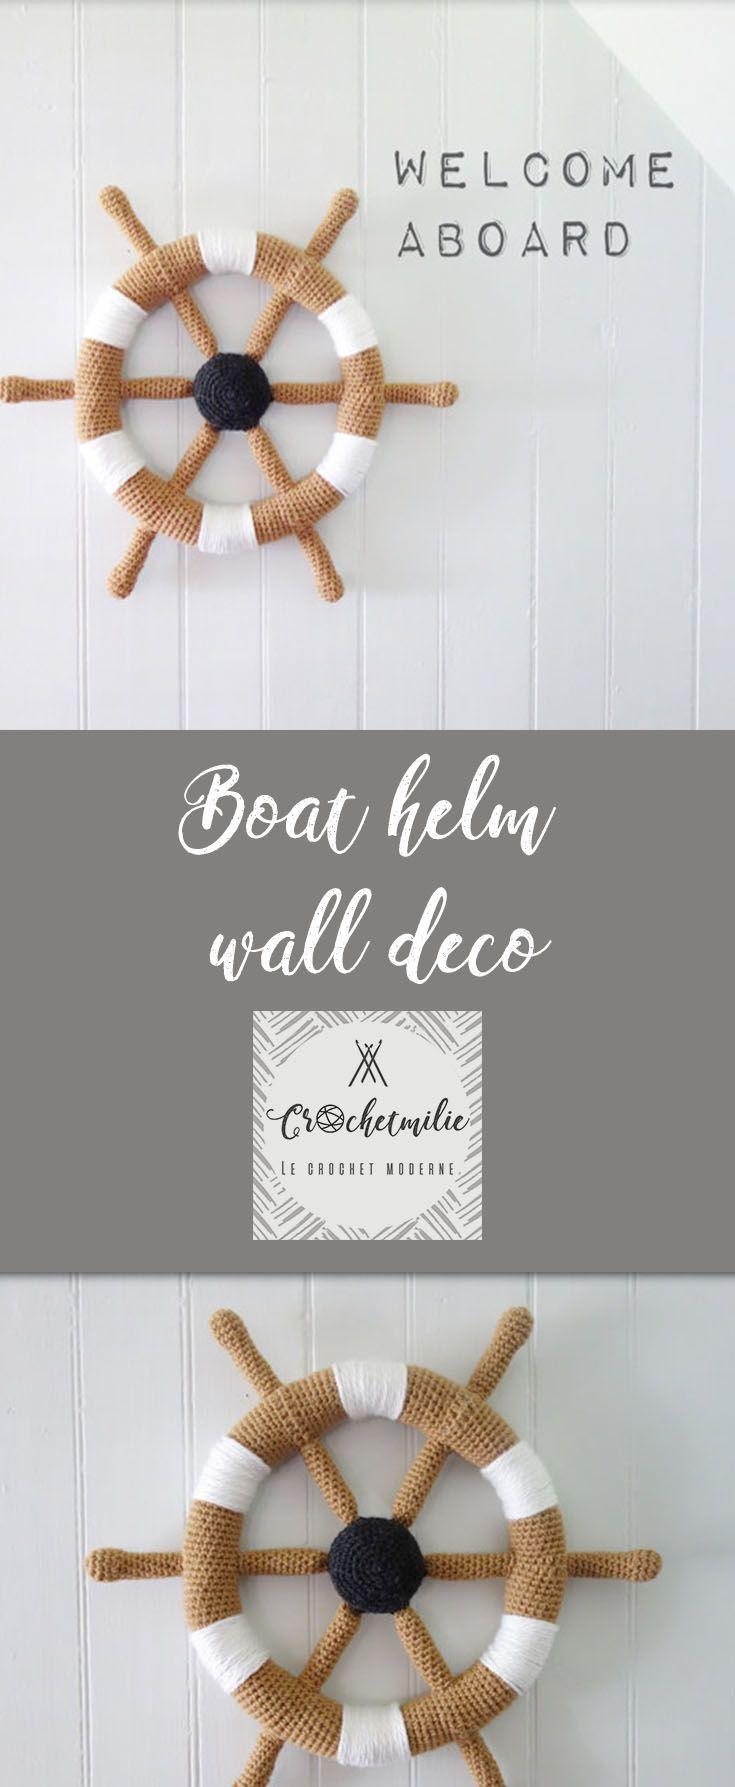 Nautical nursery decor : crochet boat helm for baby room